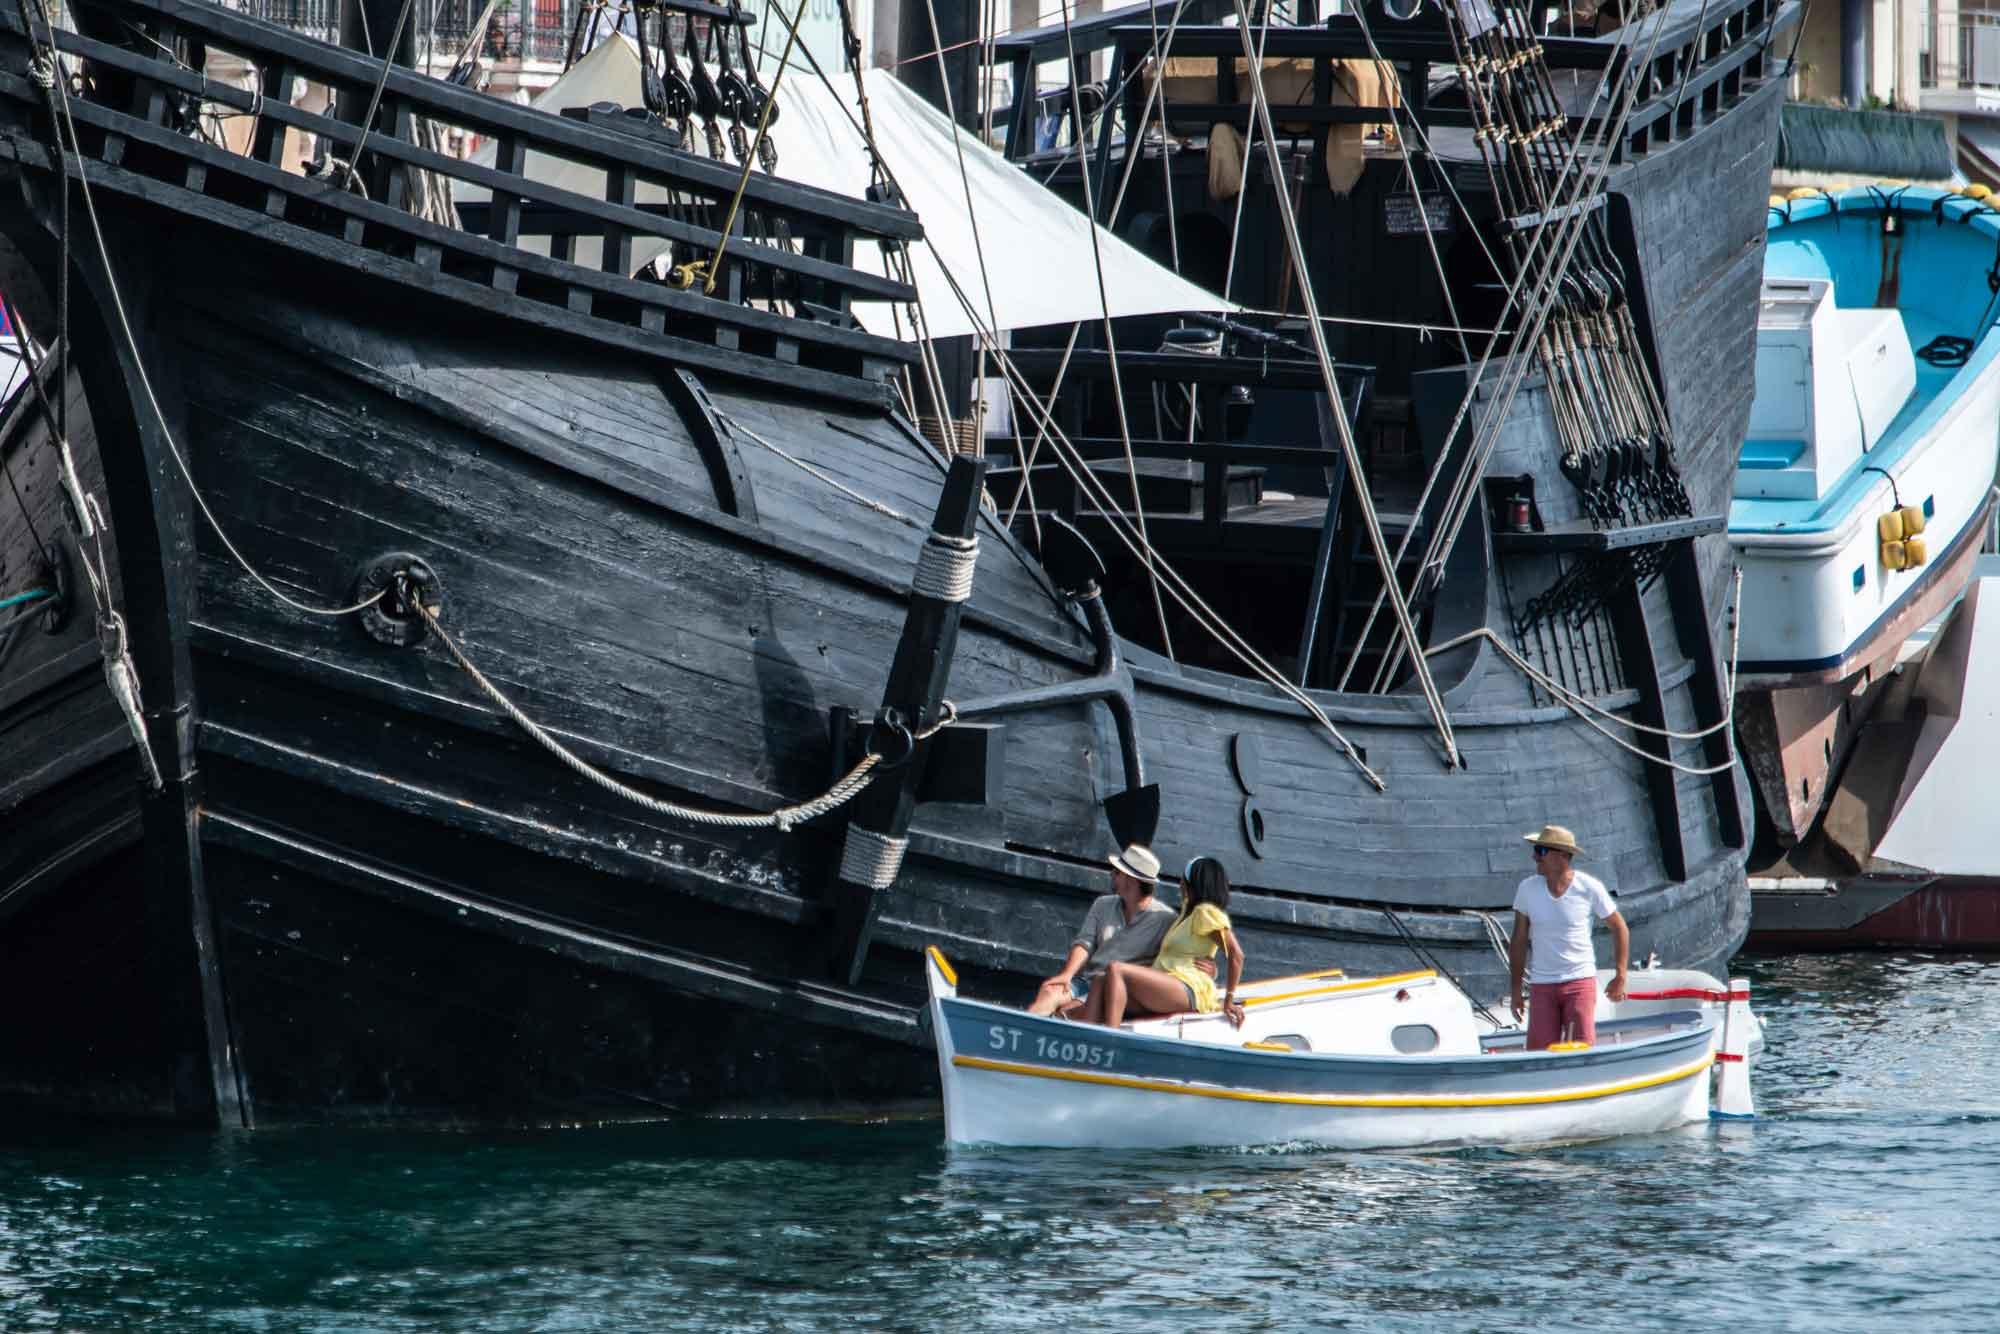 Balade en bateau - © Olivier Octobre